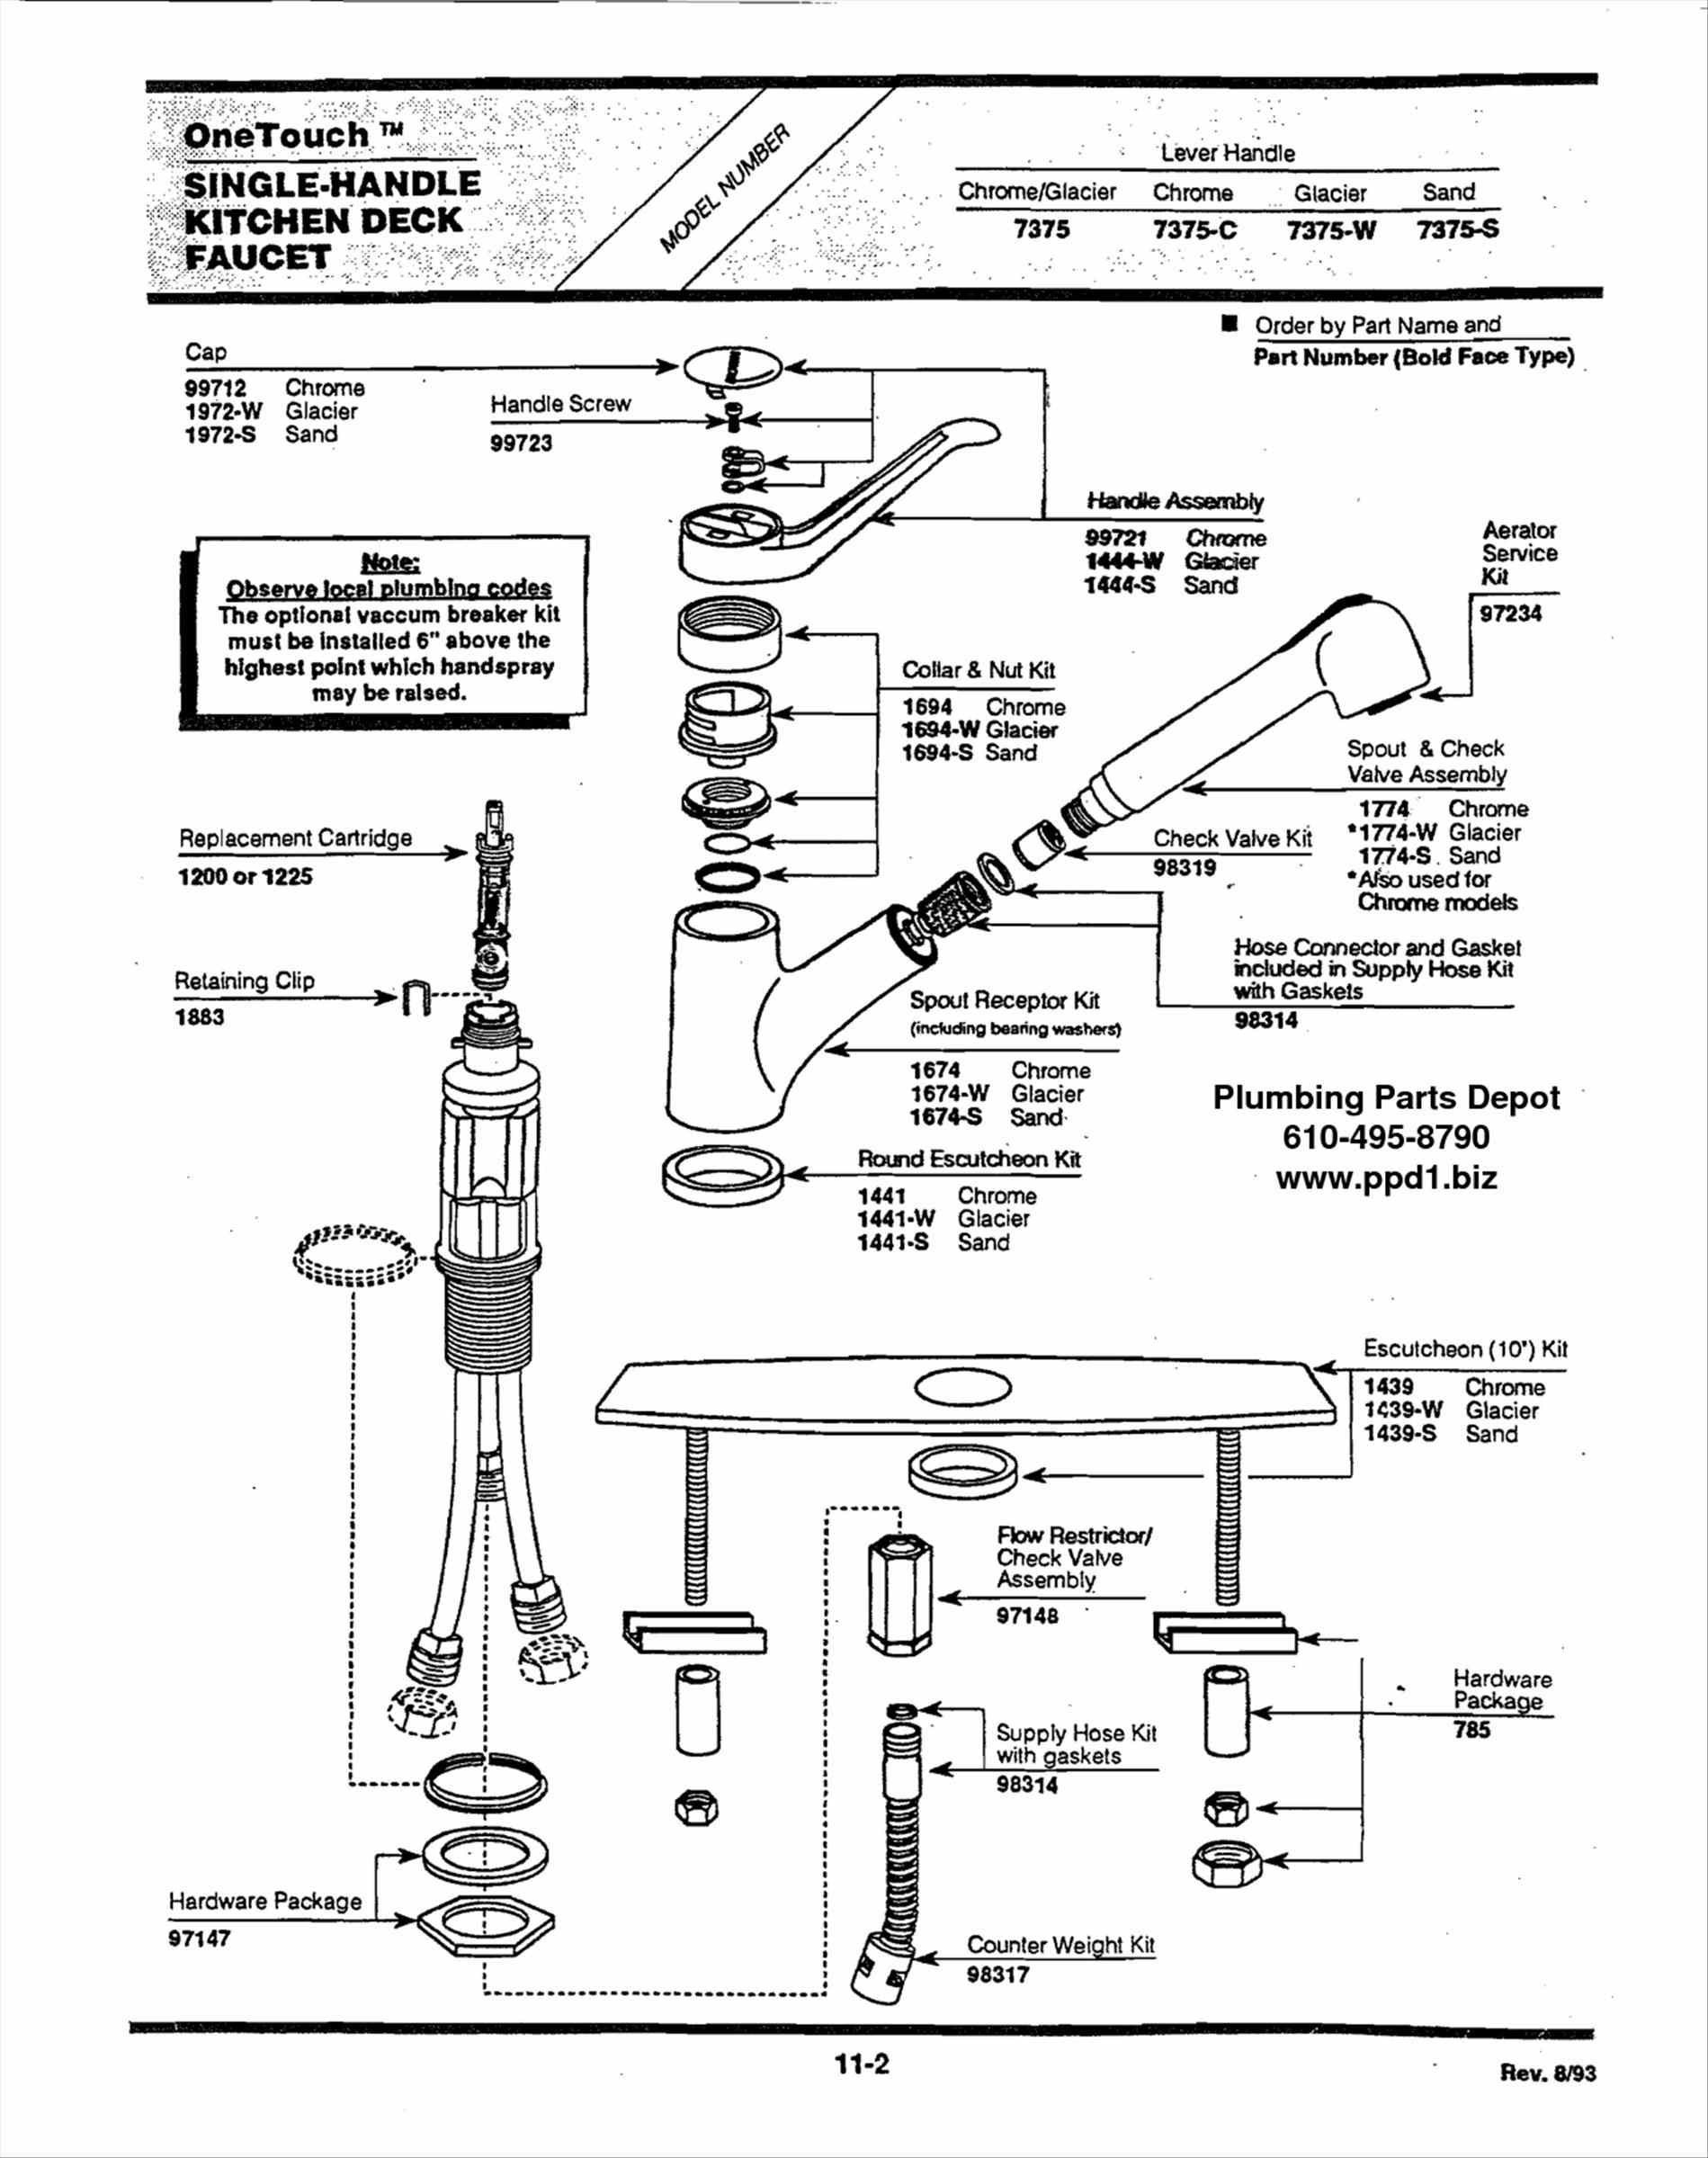 American Standard Shower Faucet Parts Diagram Elegant American Standard Shower Faucet Parts Diagram Of American Standard Shower Faucet Parts Diagram